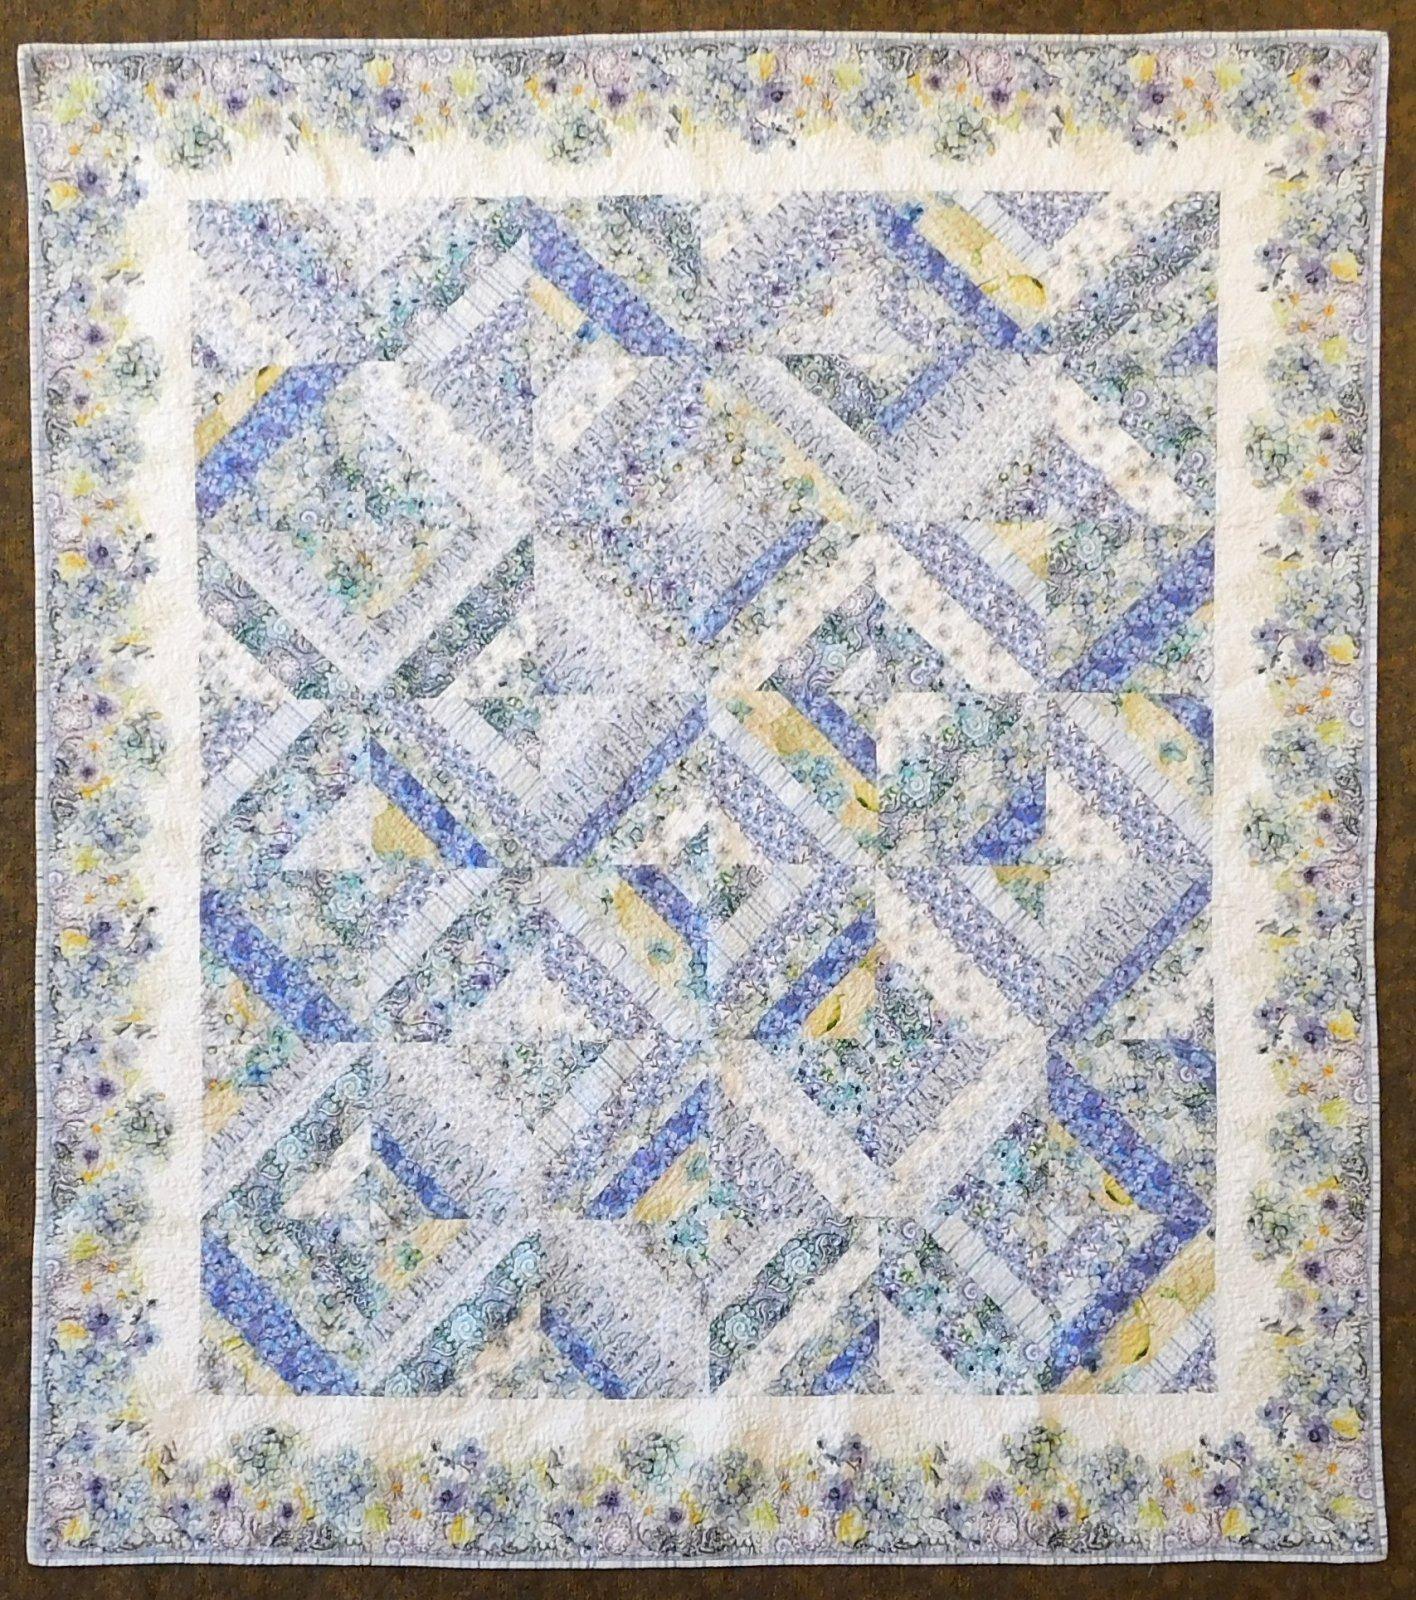 Leah Collection Quilt Kit - 79 1/2 x 89 1/2